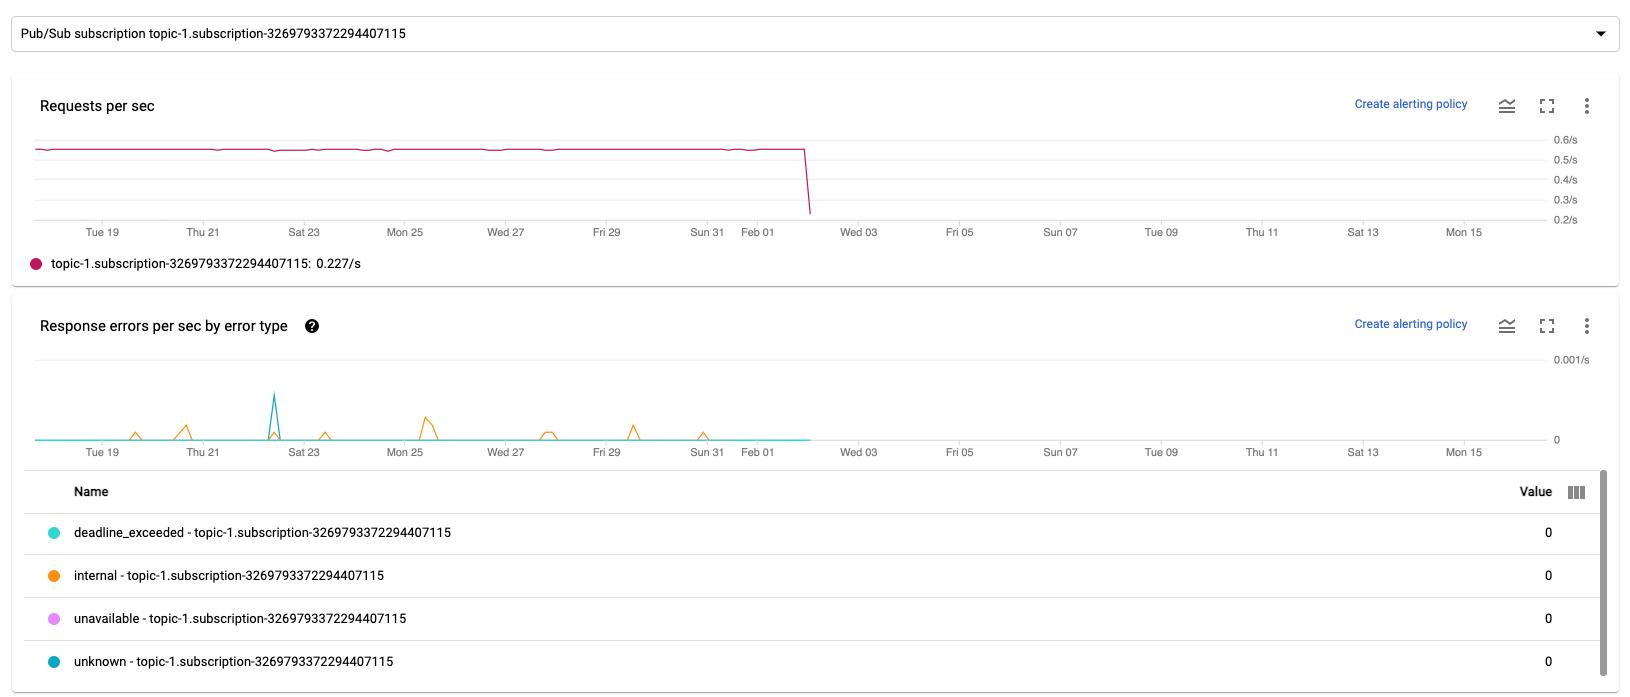 Dataflow ジョブの入力と出力の指標を示す一連のグラフ。